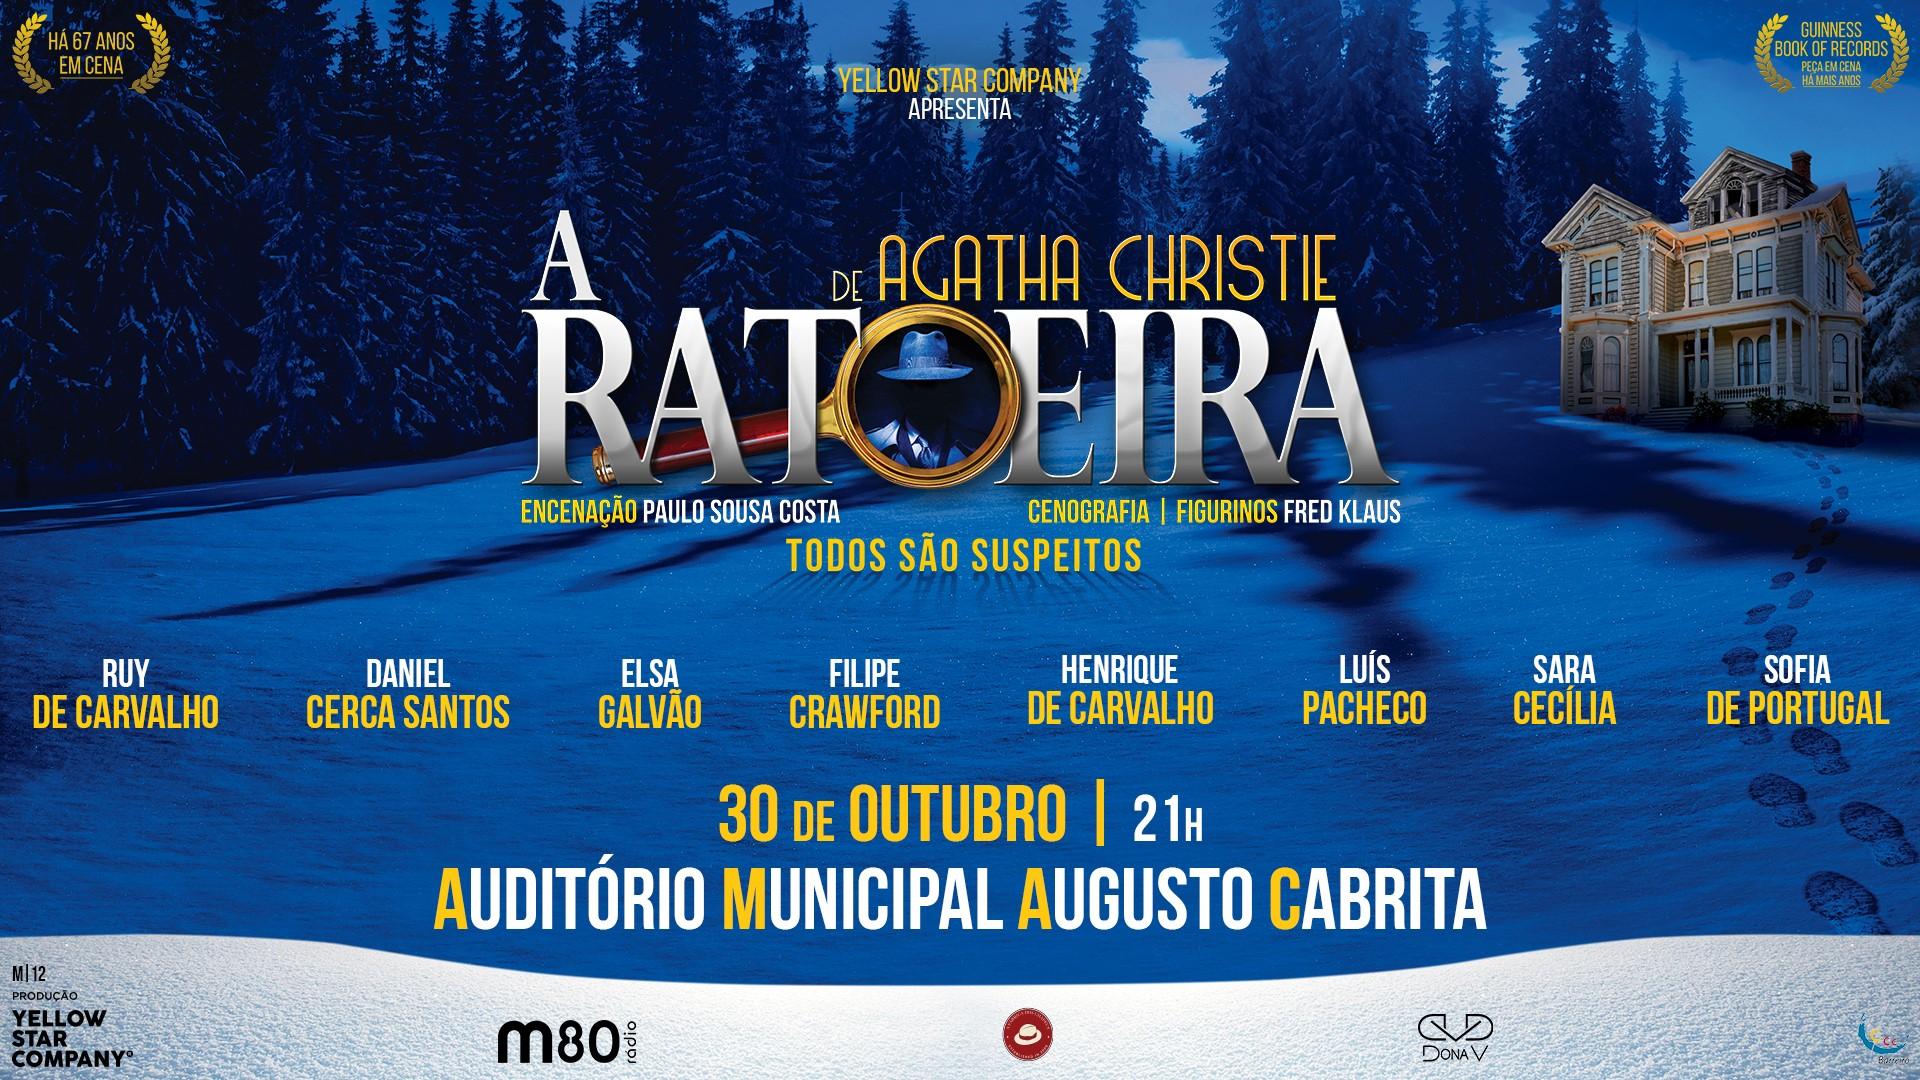 A RATOEIRA de Agatha Christie